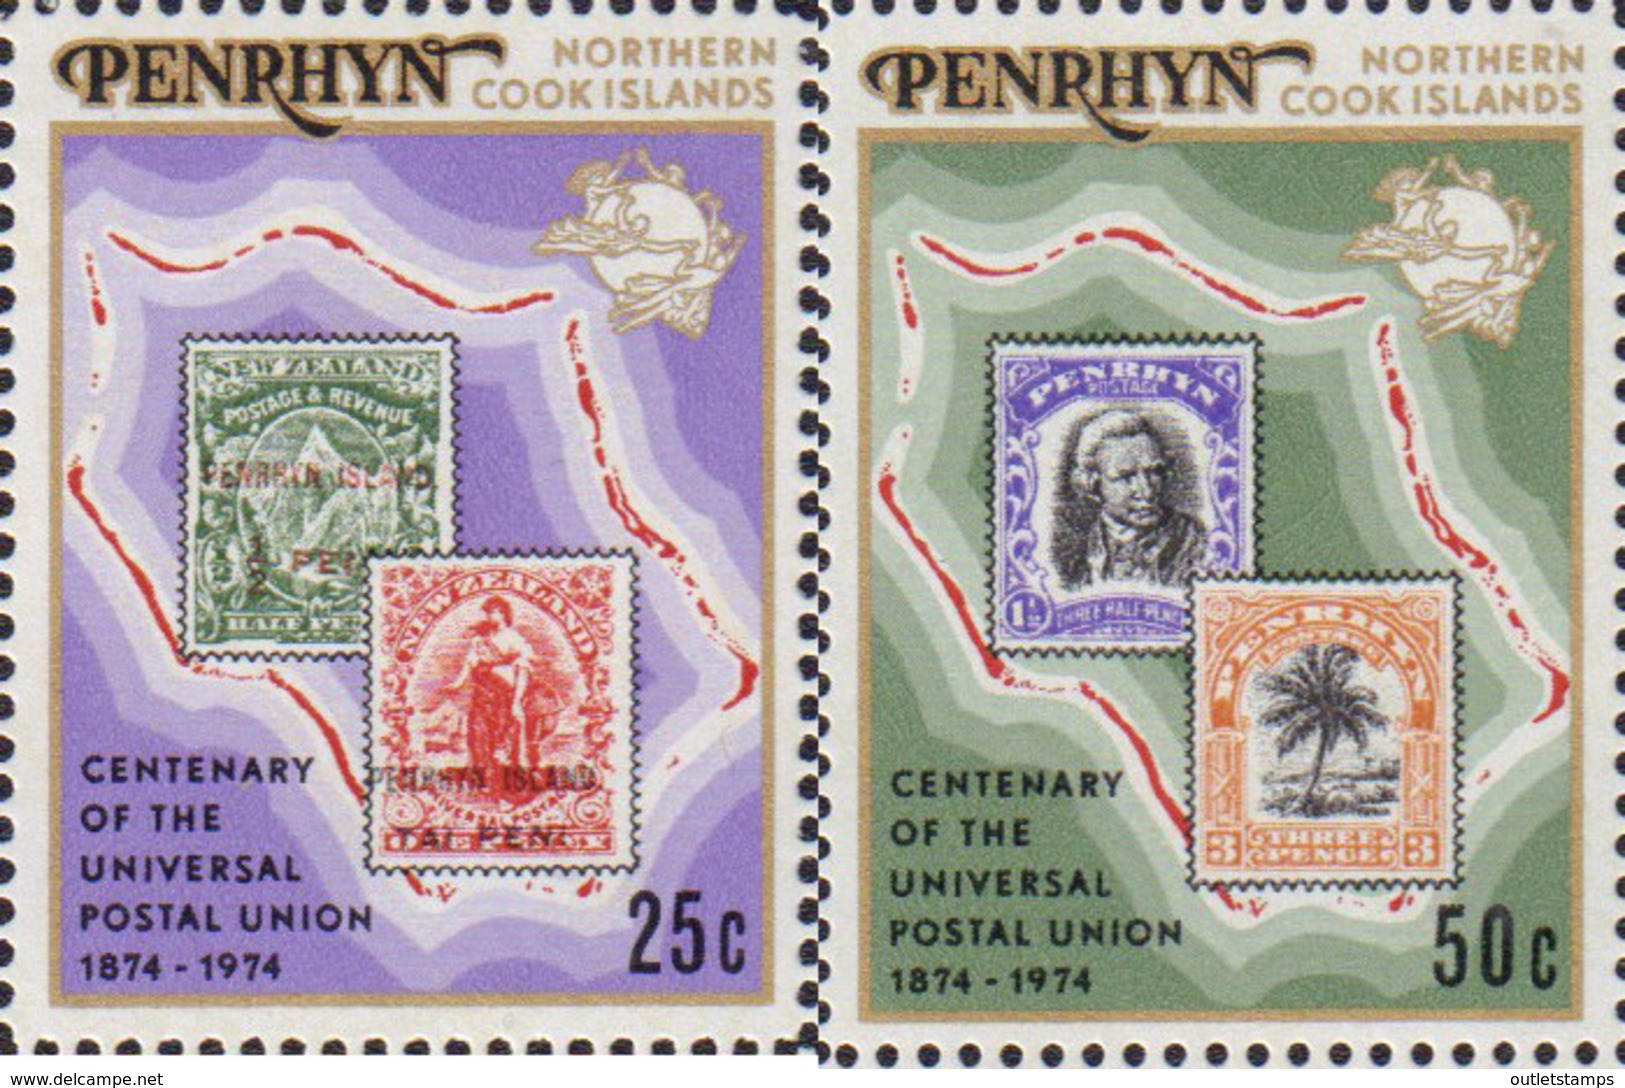 Ref. 54872 * NEW *  - PENRHYN . 1974. CENTENARY OF UNIVERSAL POSTAL UNION. CENTENARIO DE LA UNION POSTAL UNIVERSAL - Penrhyn